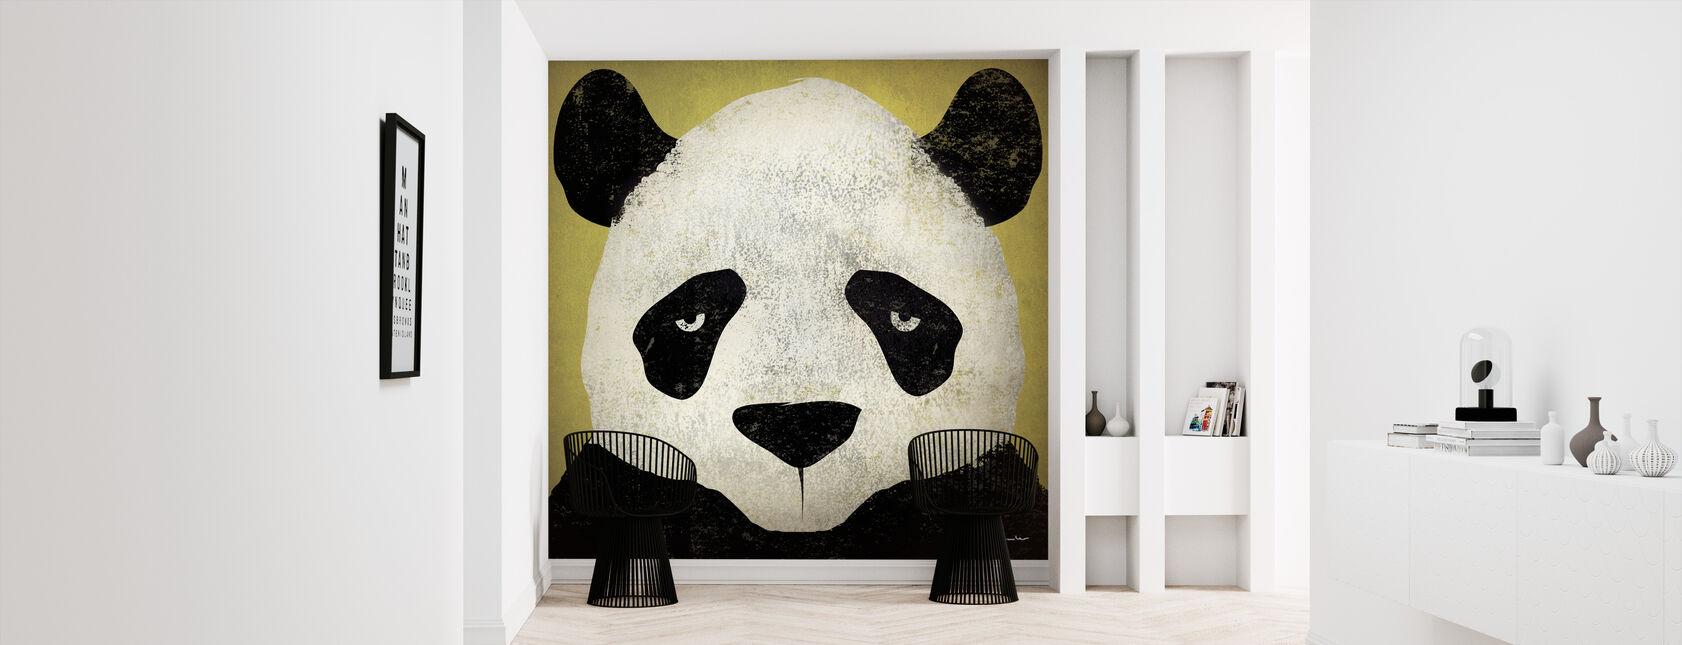 Ryan Fowler - Panda - Behang - Gang